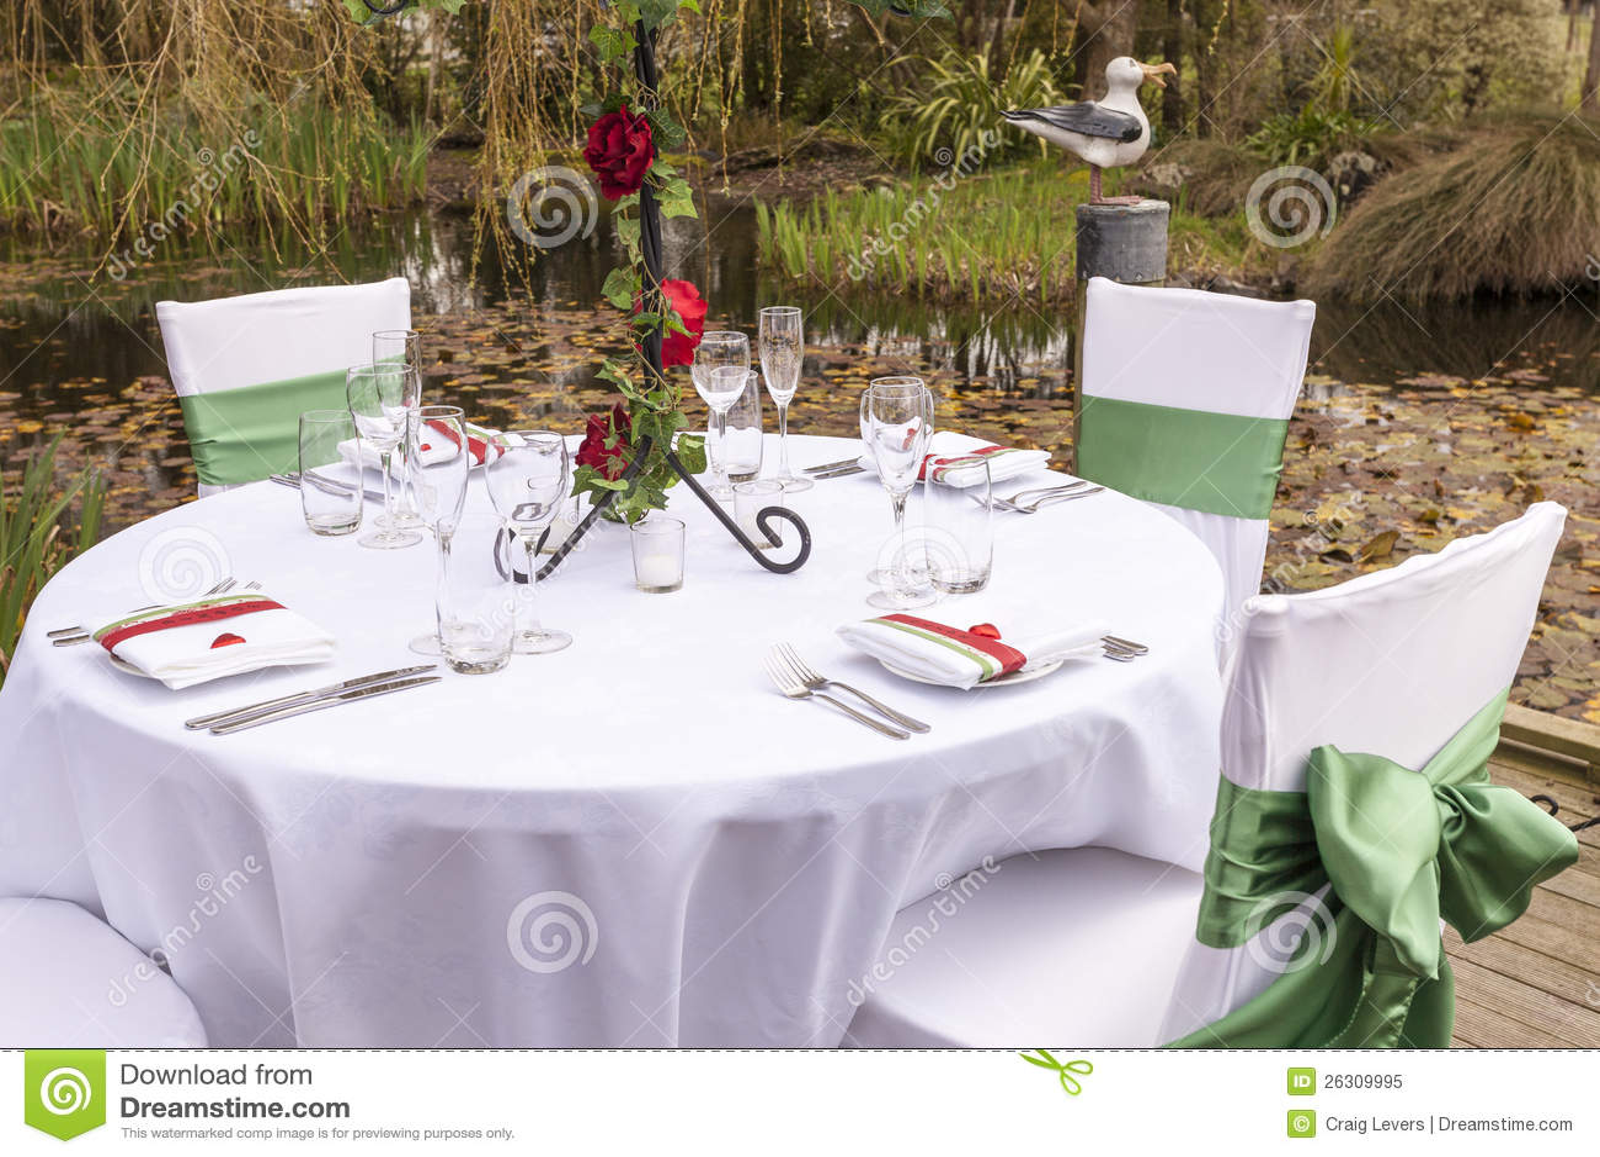 Wedding table setting 4 stock image image of pond for Garden wedding table settings